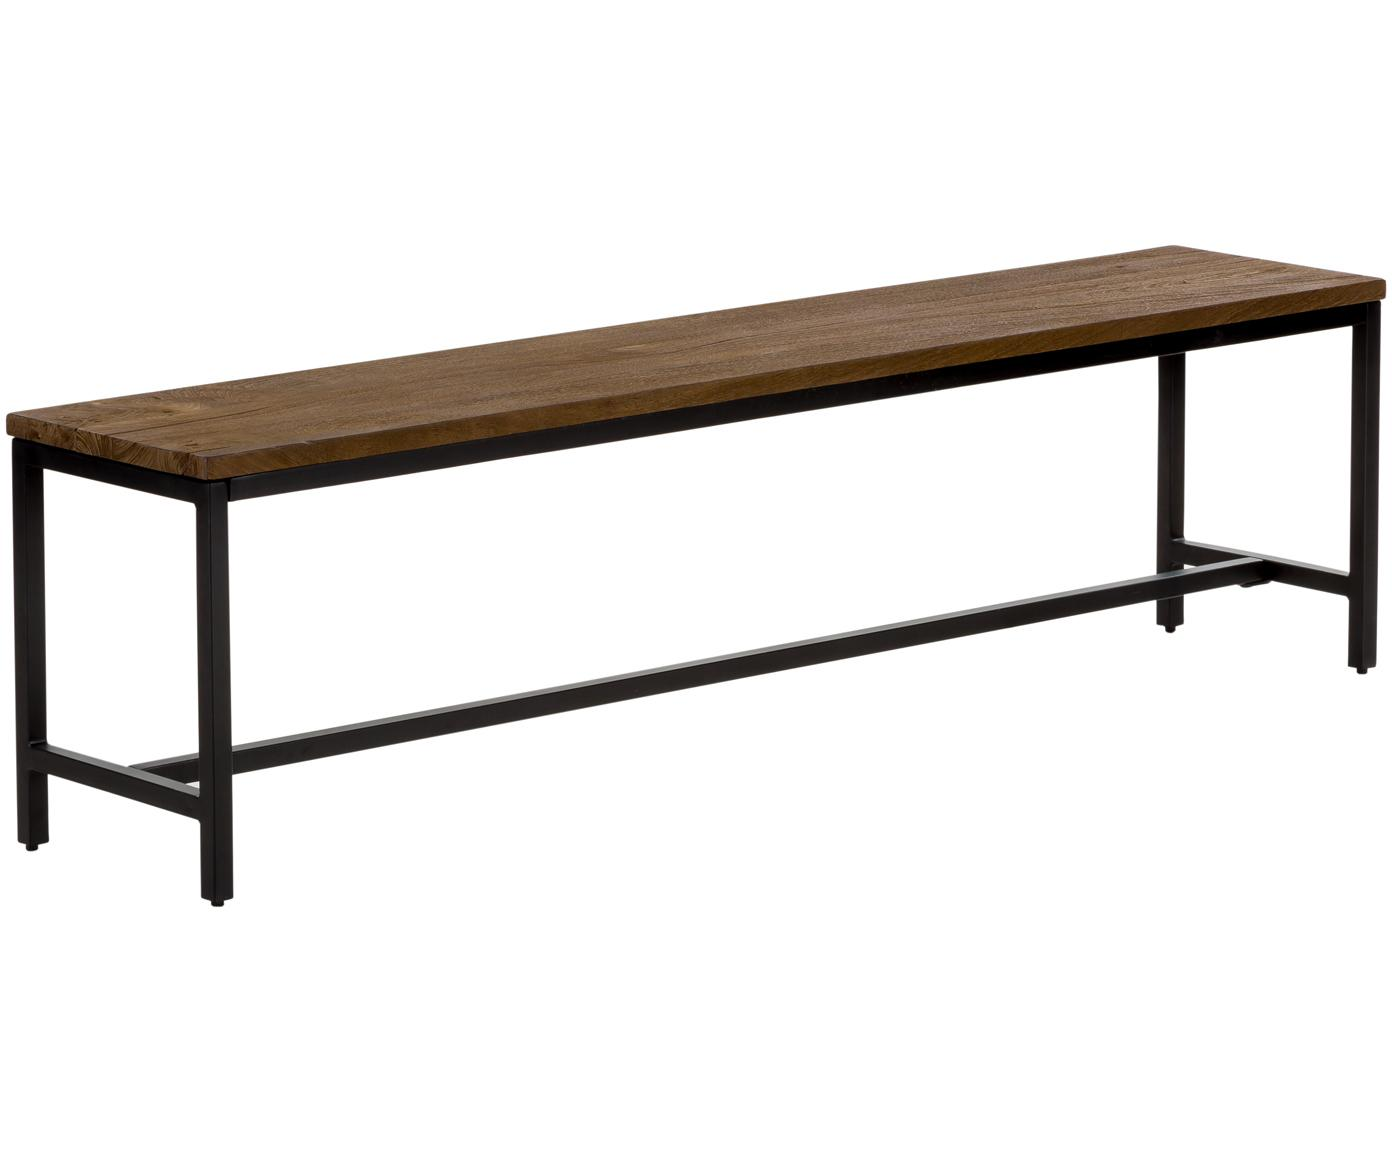 Banco de madera maciza Raw, Asiento: madera de mango maciza, c, Estructura: hierro, pintado en polvo, Madera de mango, negro, An 177 x Al 47 cm